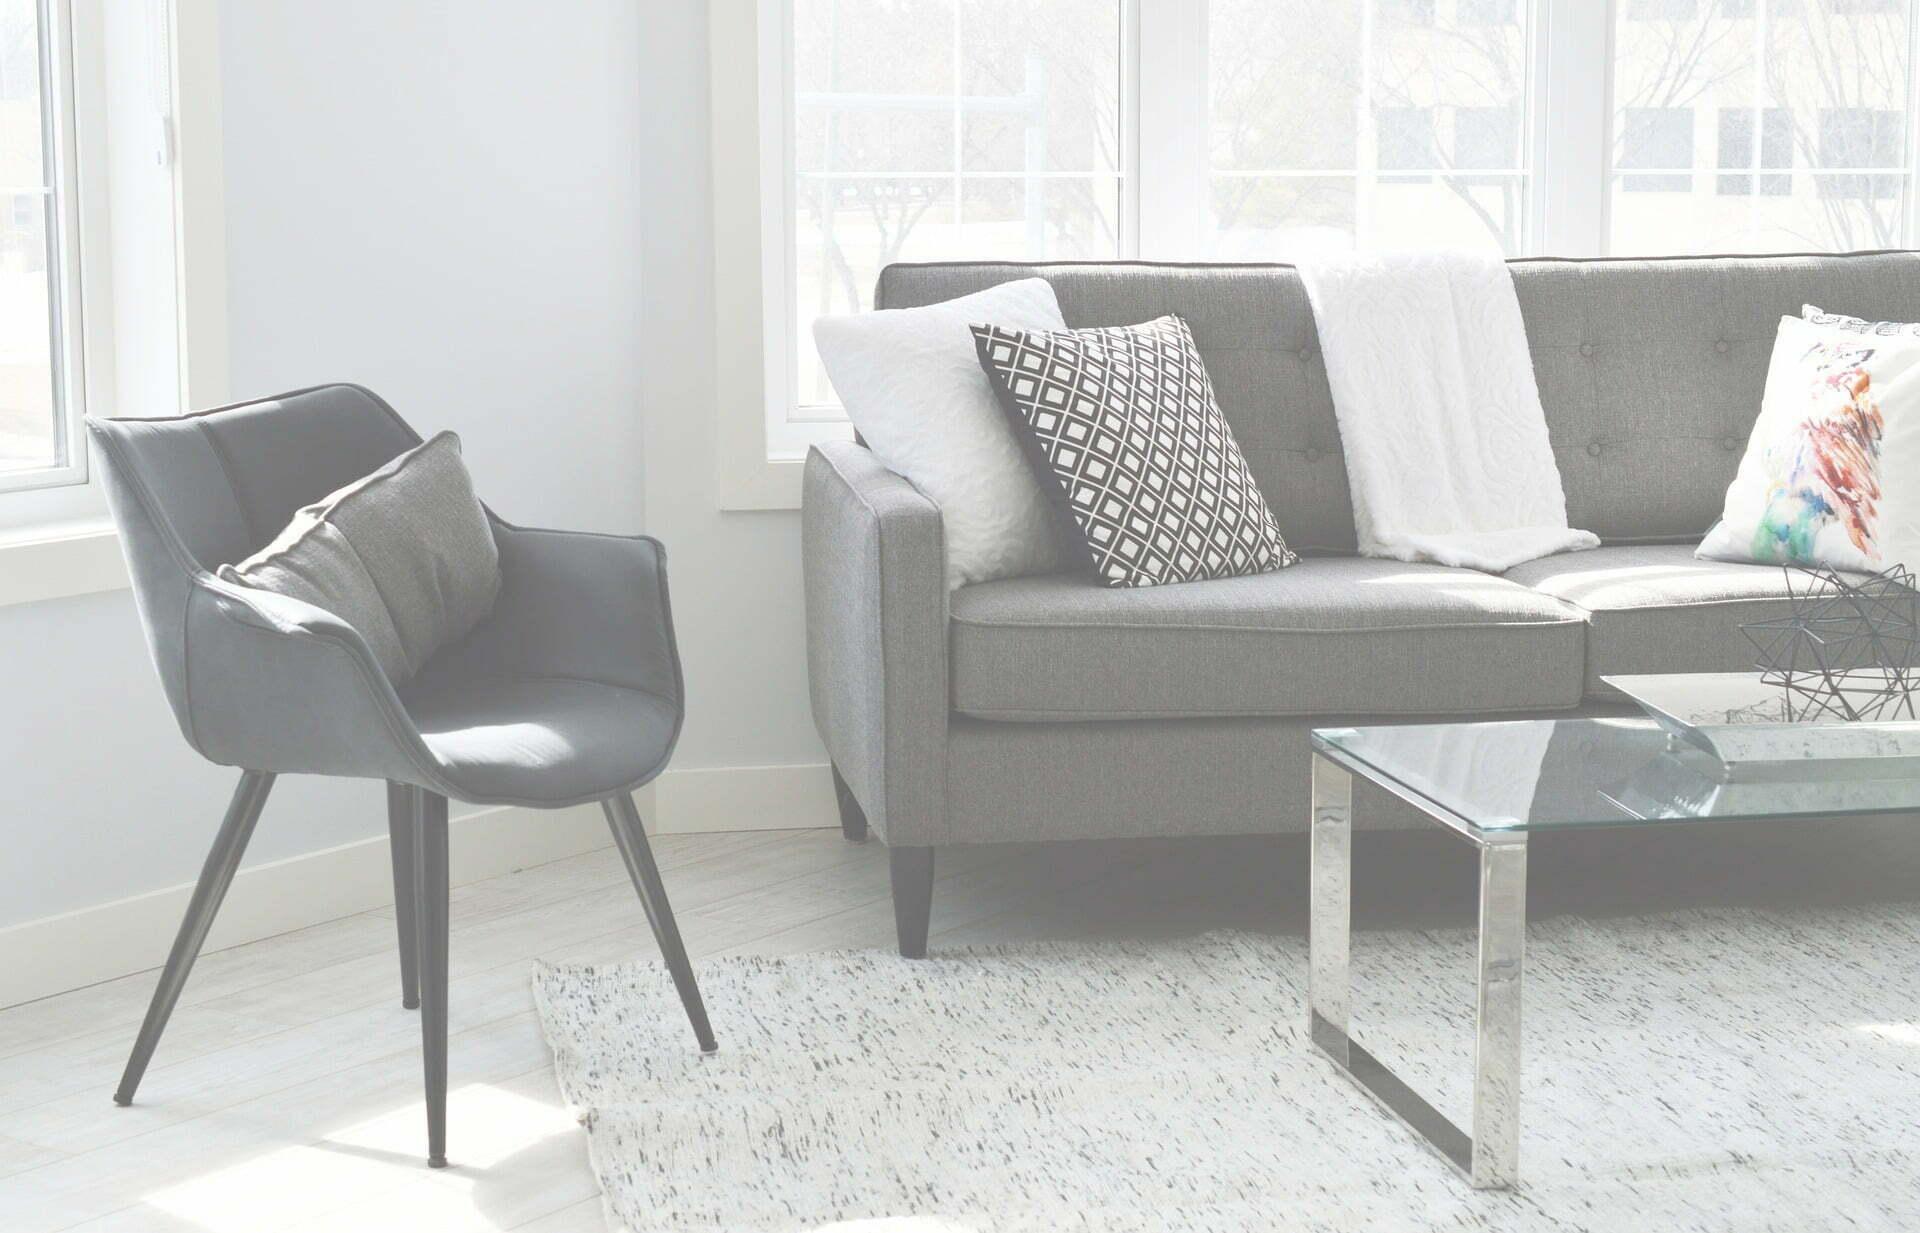 Komfort i minimalizm